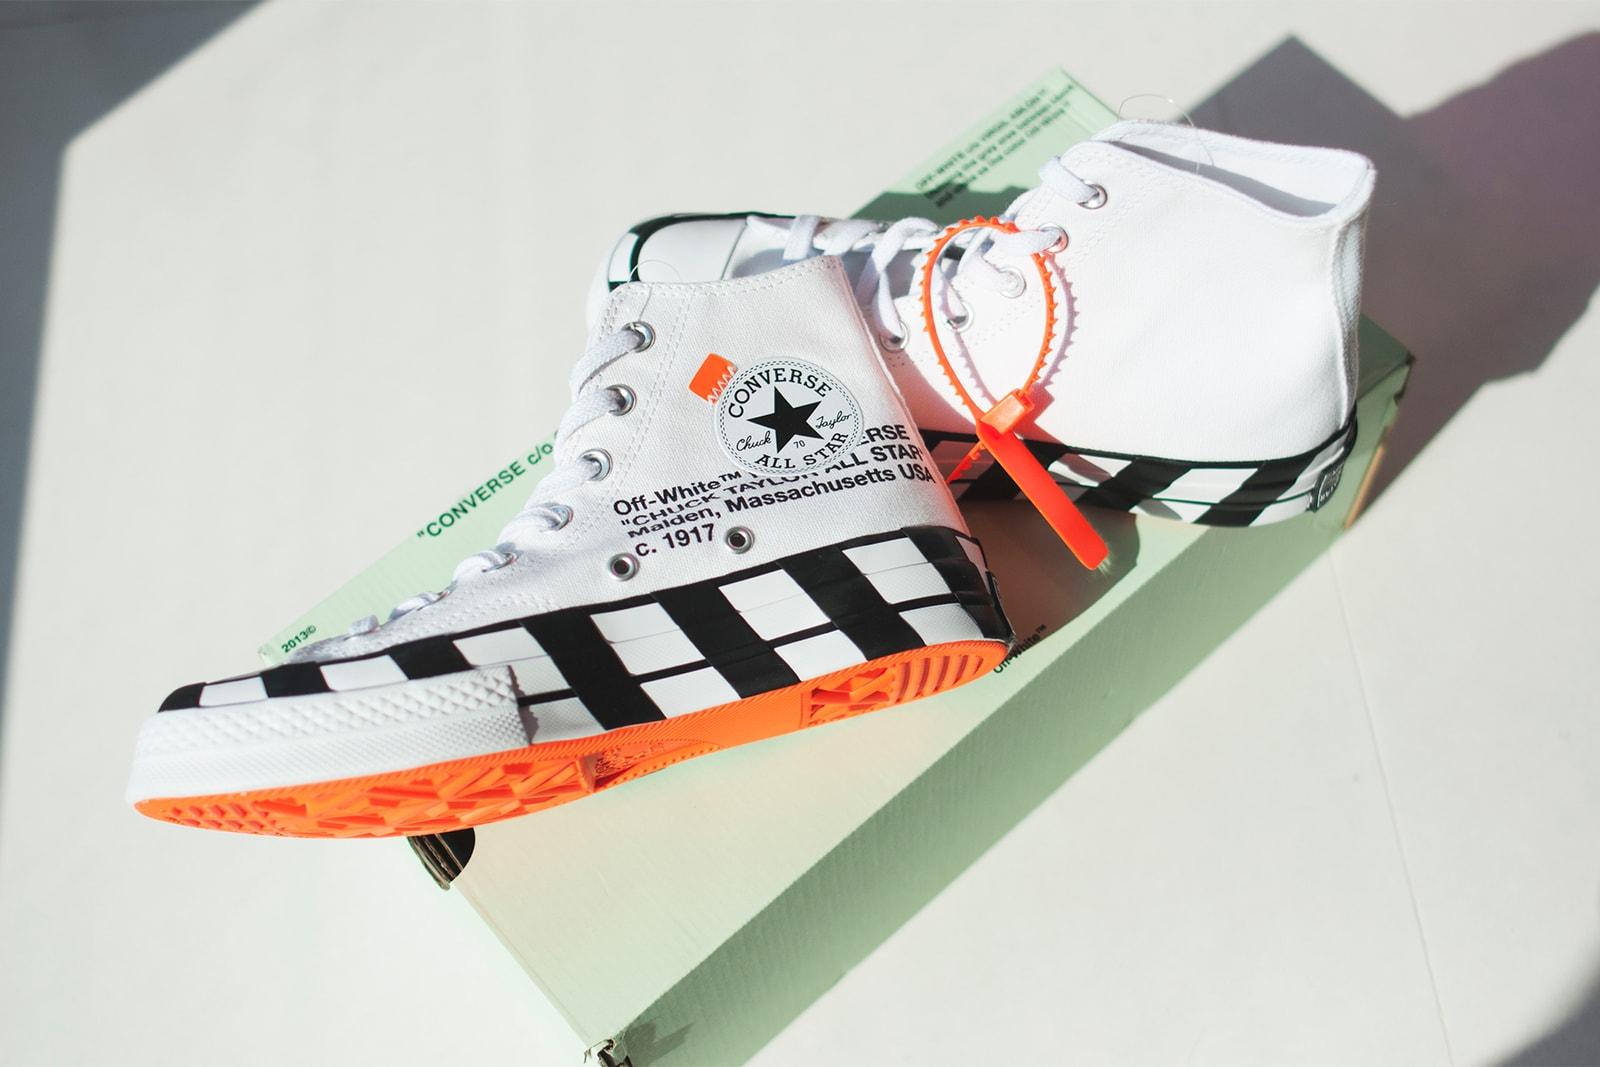 b0b3f1384ab8 Off-White x Converse Chuck 70 White Release Date